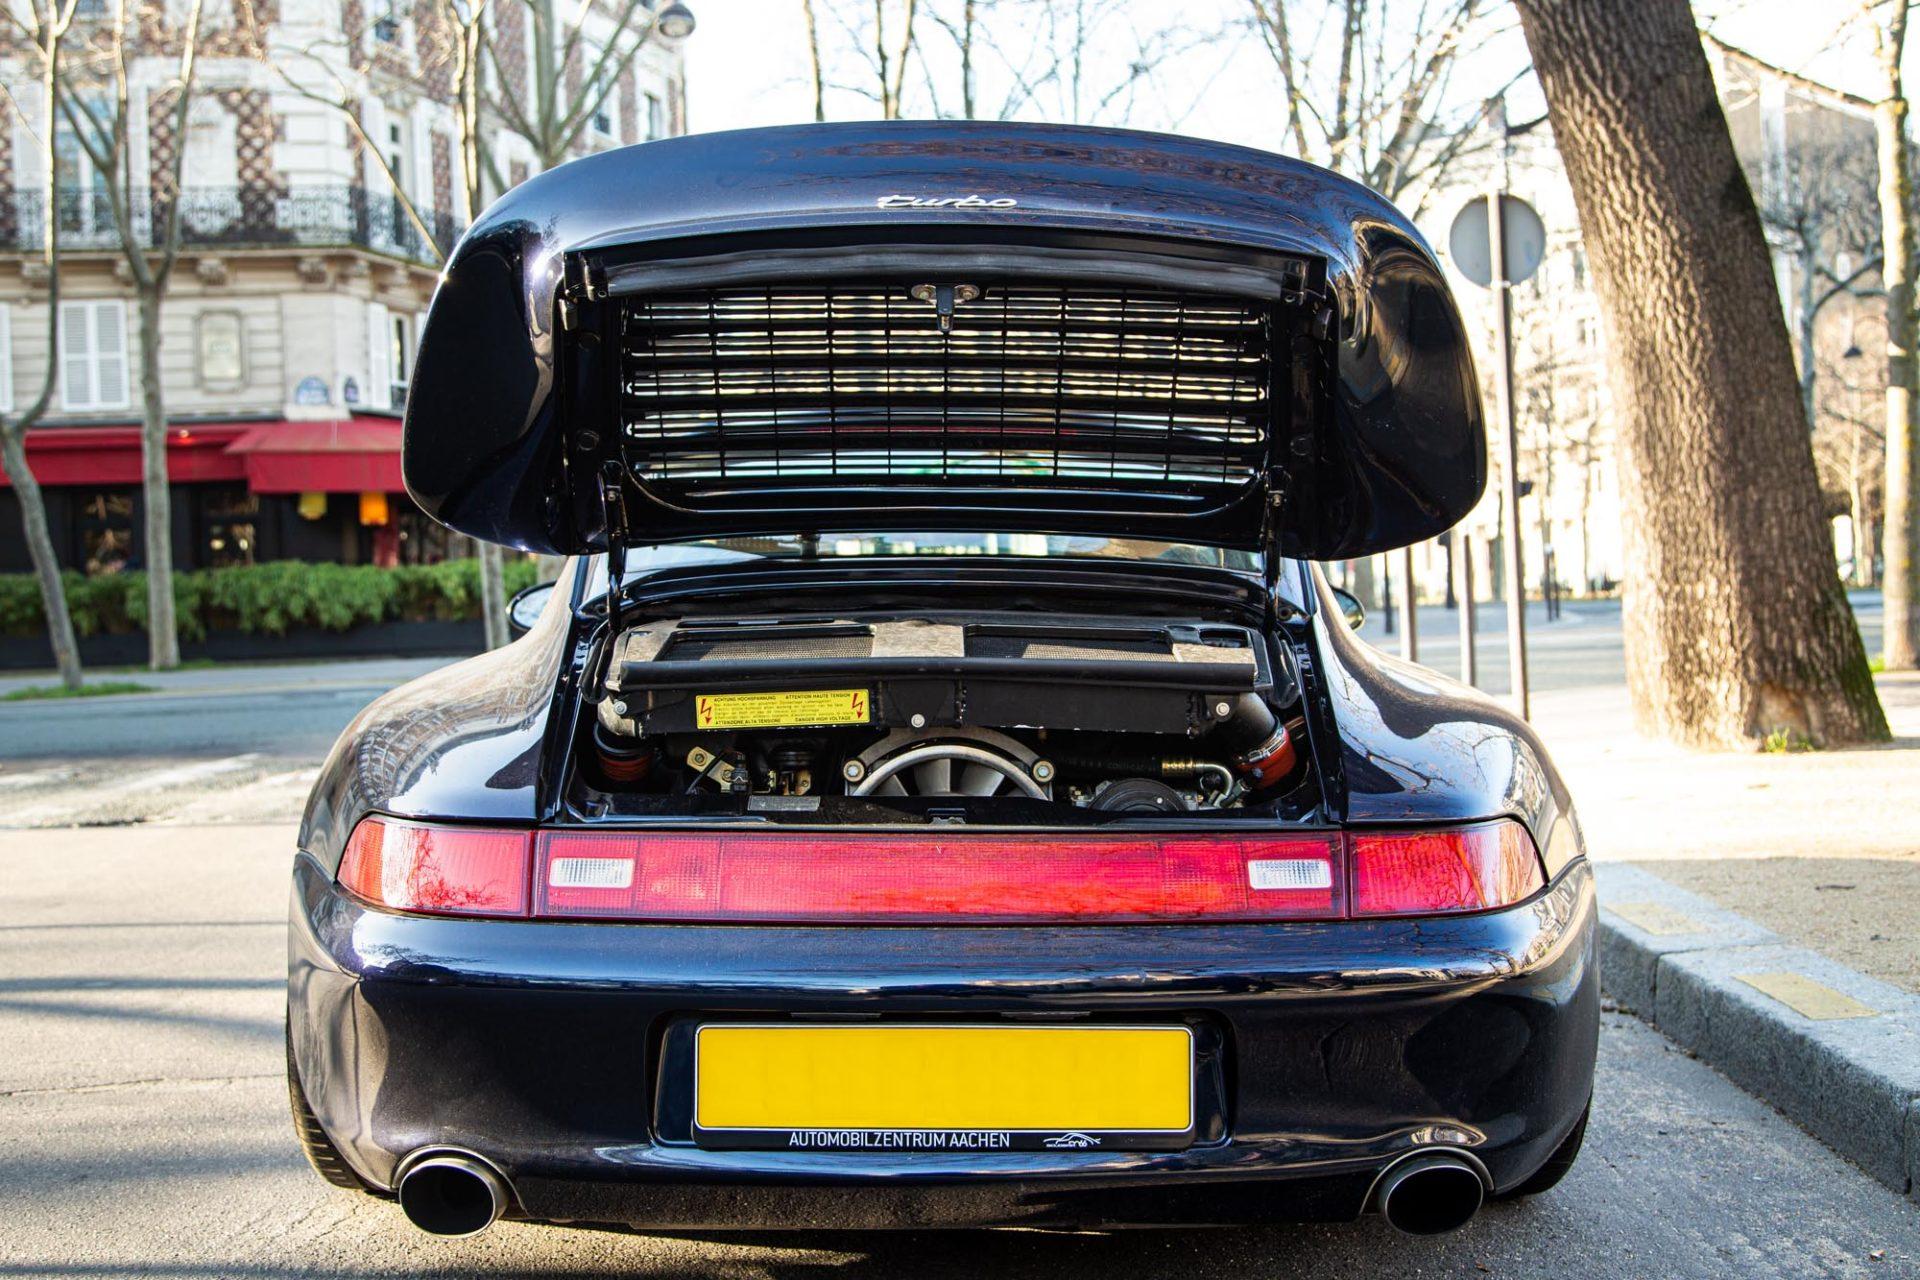 Porsche 911 Type 993 Turbo - Moteur